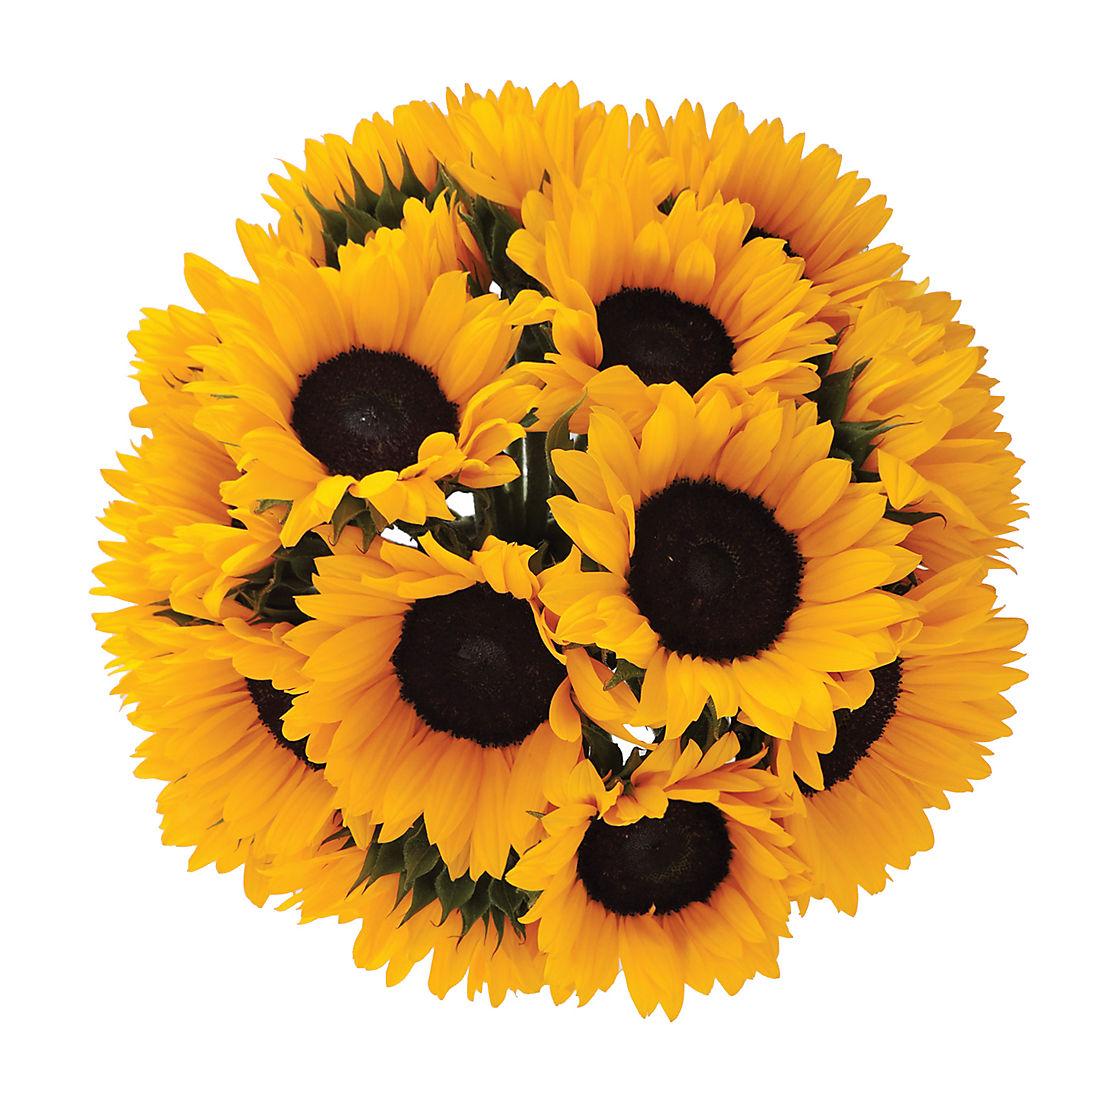 Surprising Yellow Sunflowers 40 Stems Bjs Wholesale Club Spiritservingveterans Wood Chair Design Ideas Spiritservingveteransorg